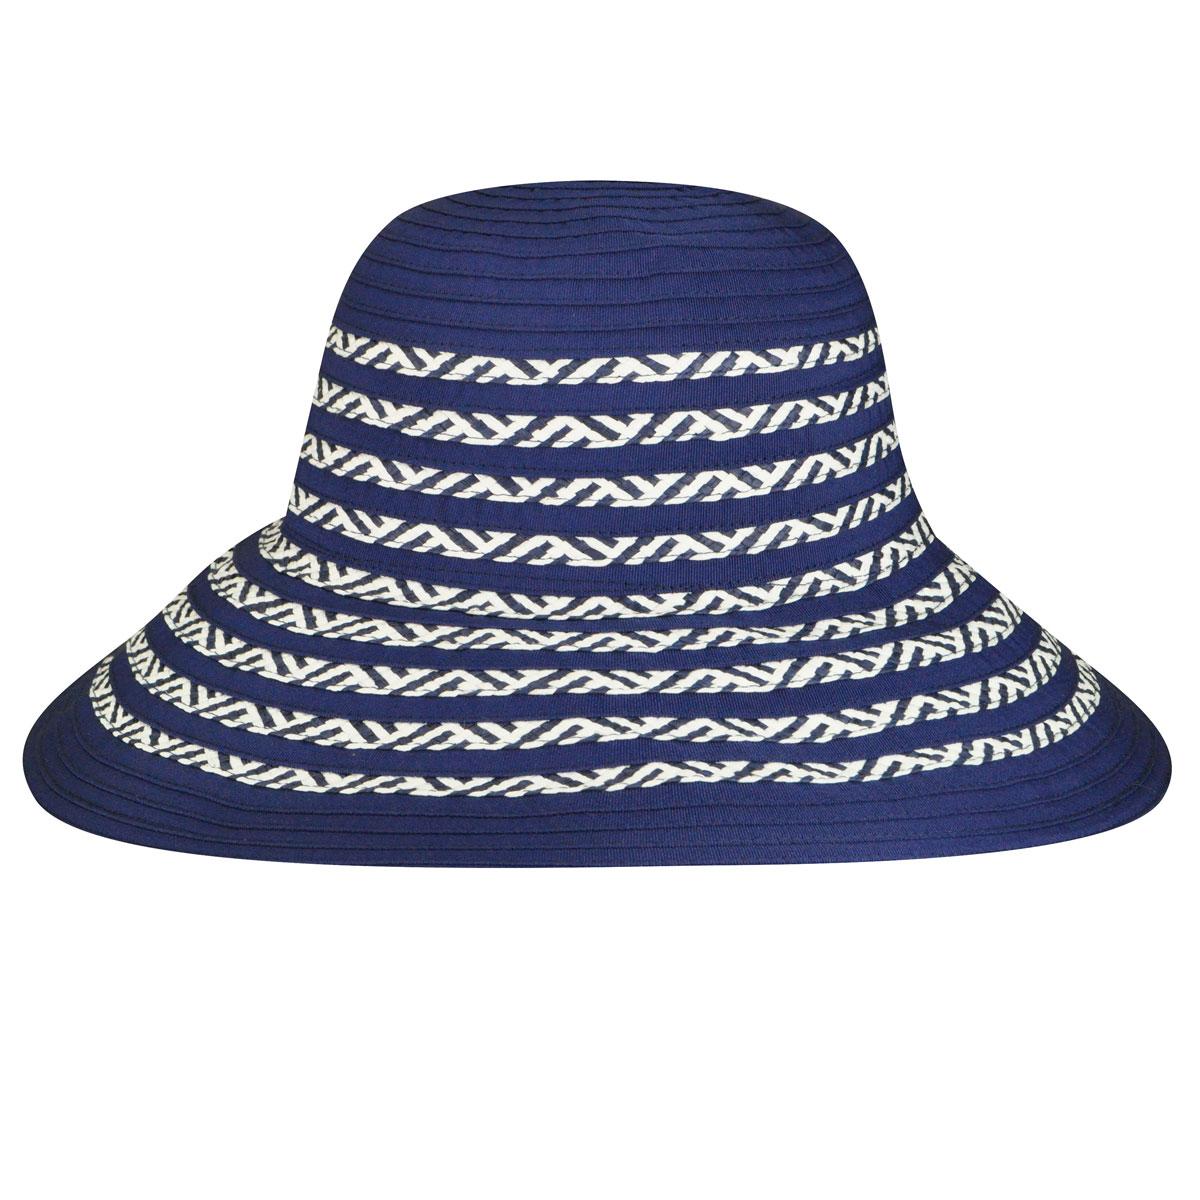 Betmar Corsica Wide Brim Hat in Navy,White